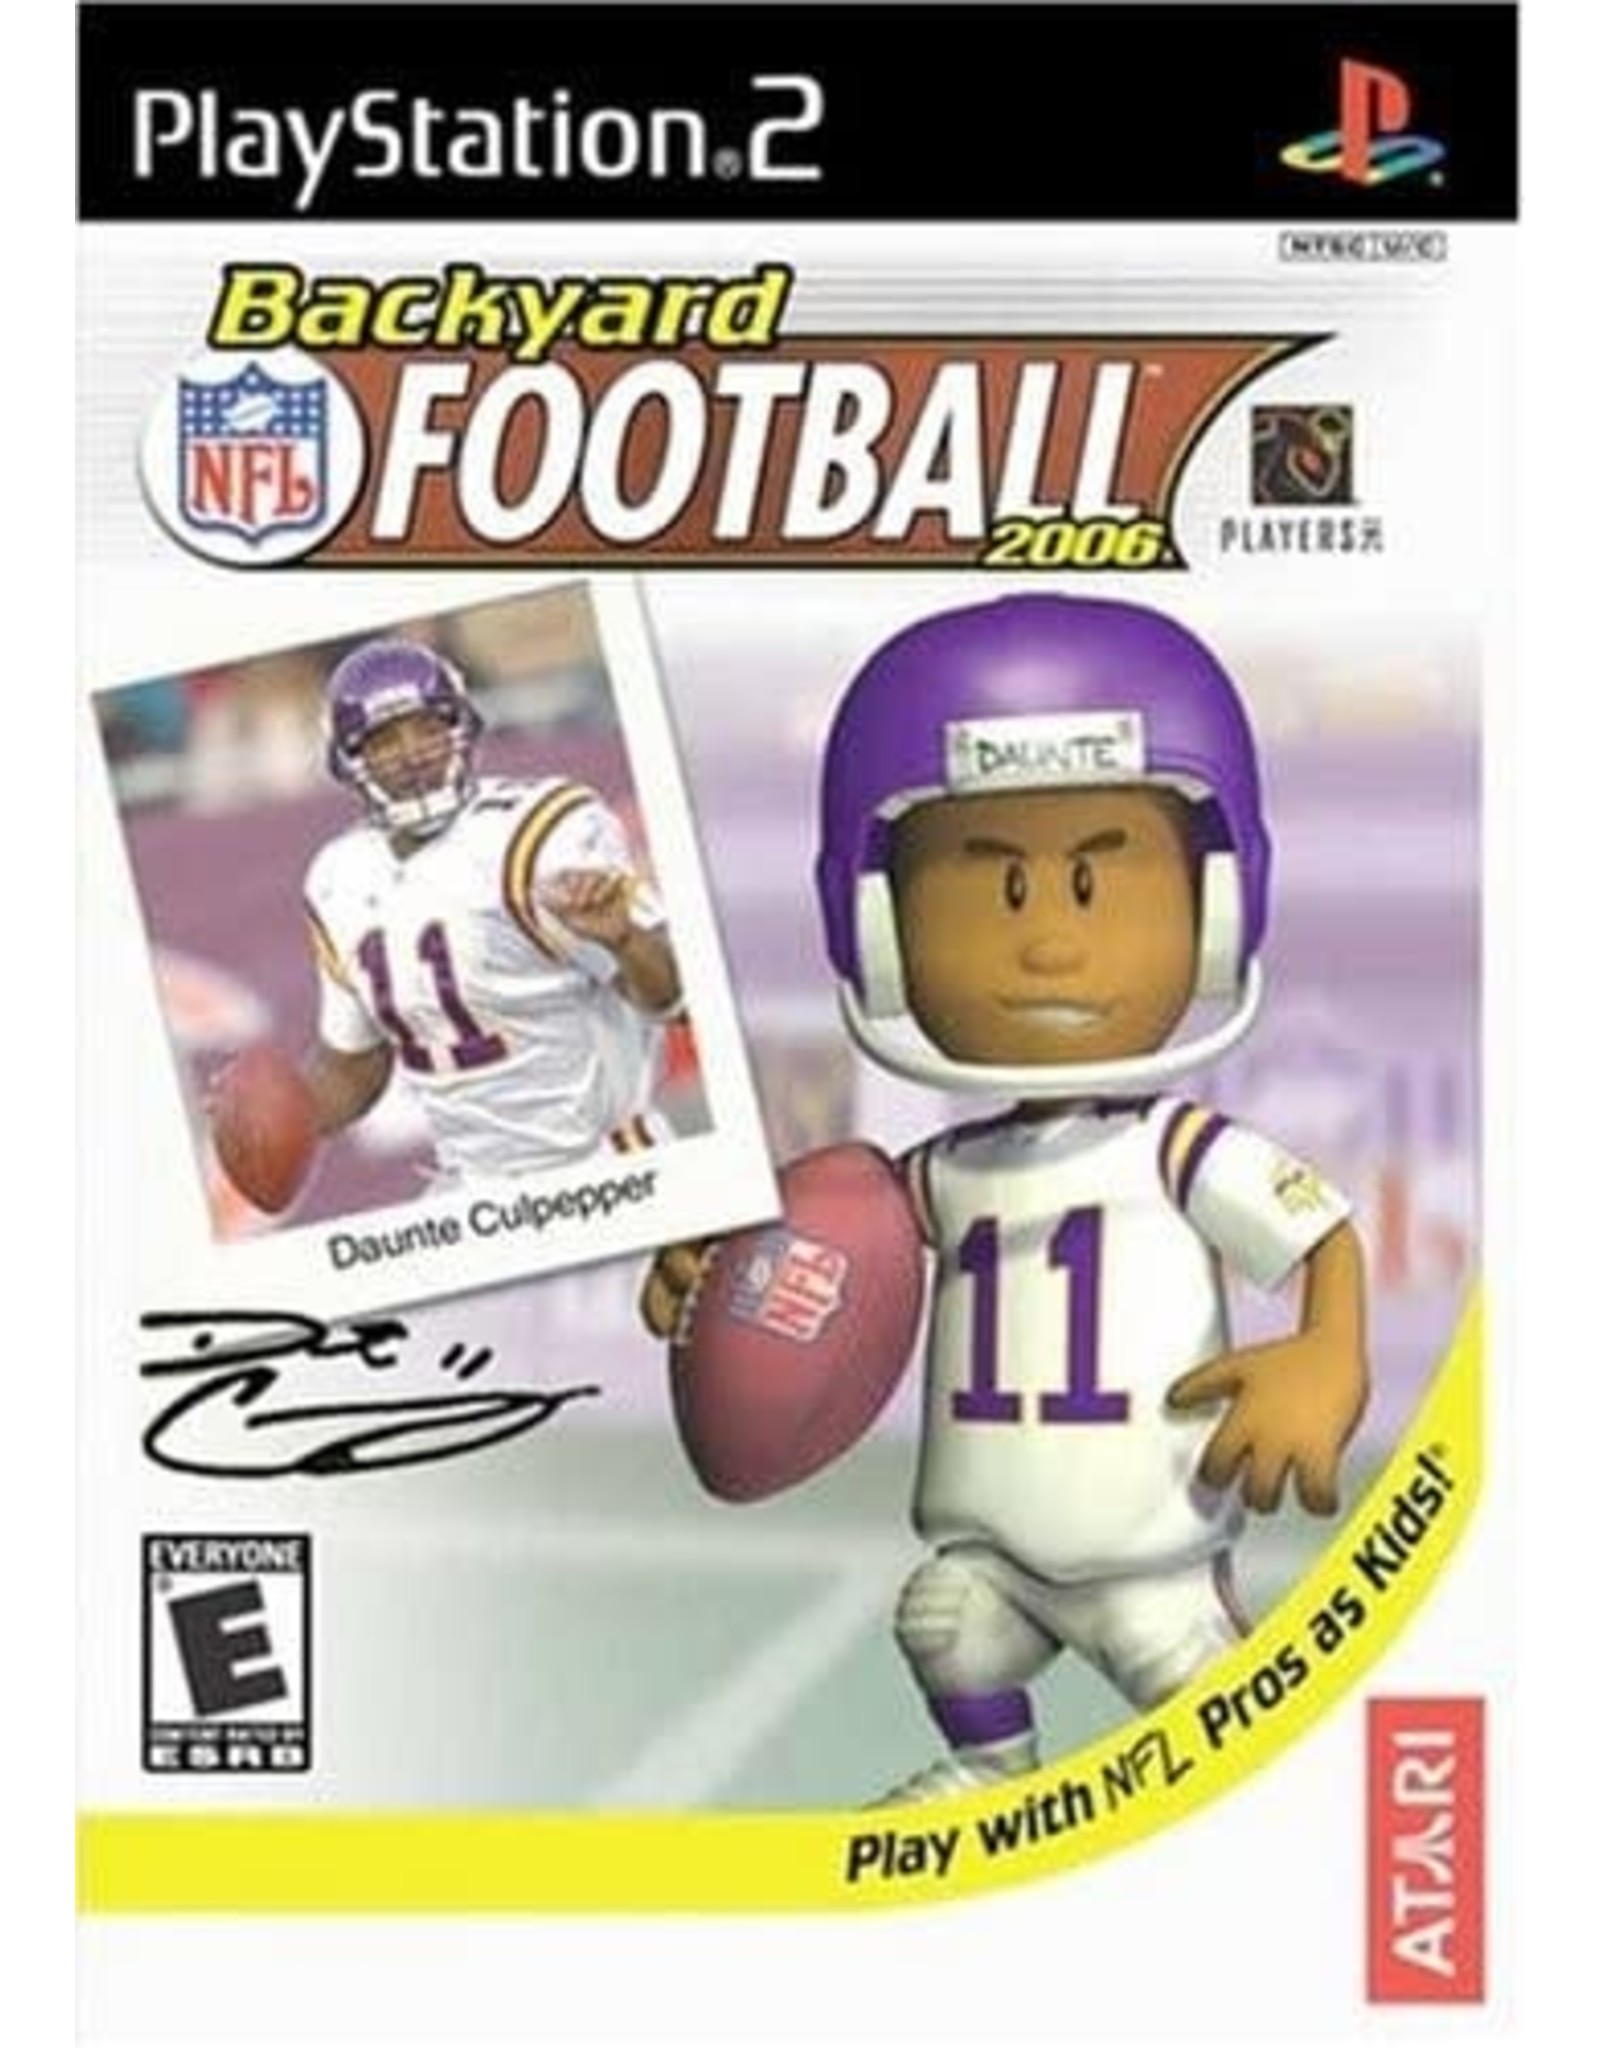 Playstation 2 Backyard Football 2006 (CiB)